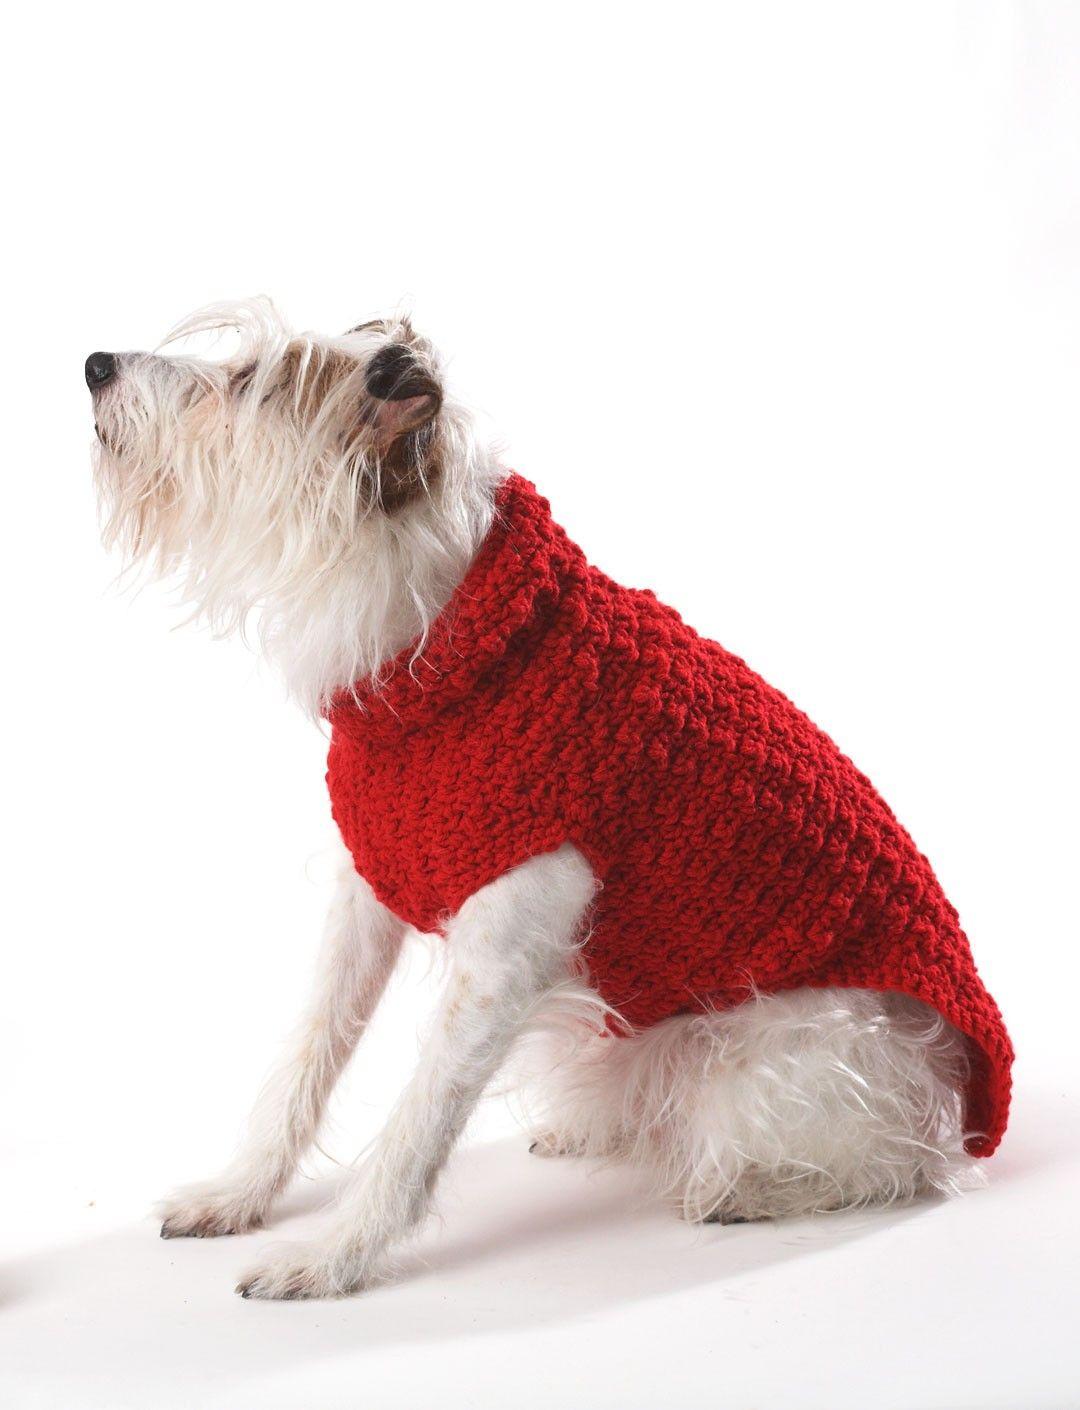 Crochet Dog Coat - Crochet Patterns - Patterns | Yarnspirations ...